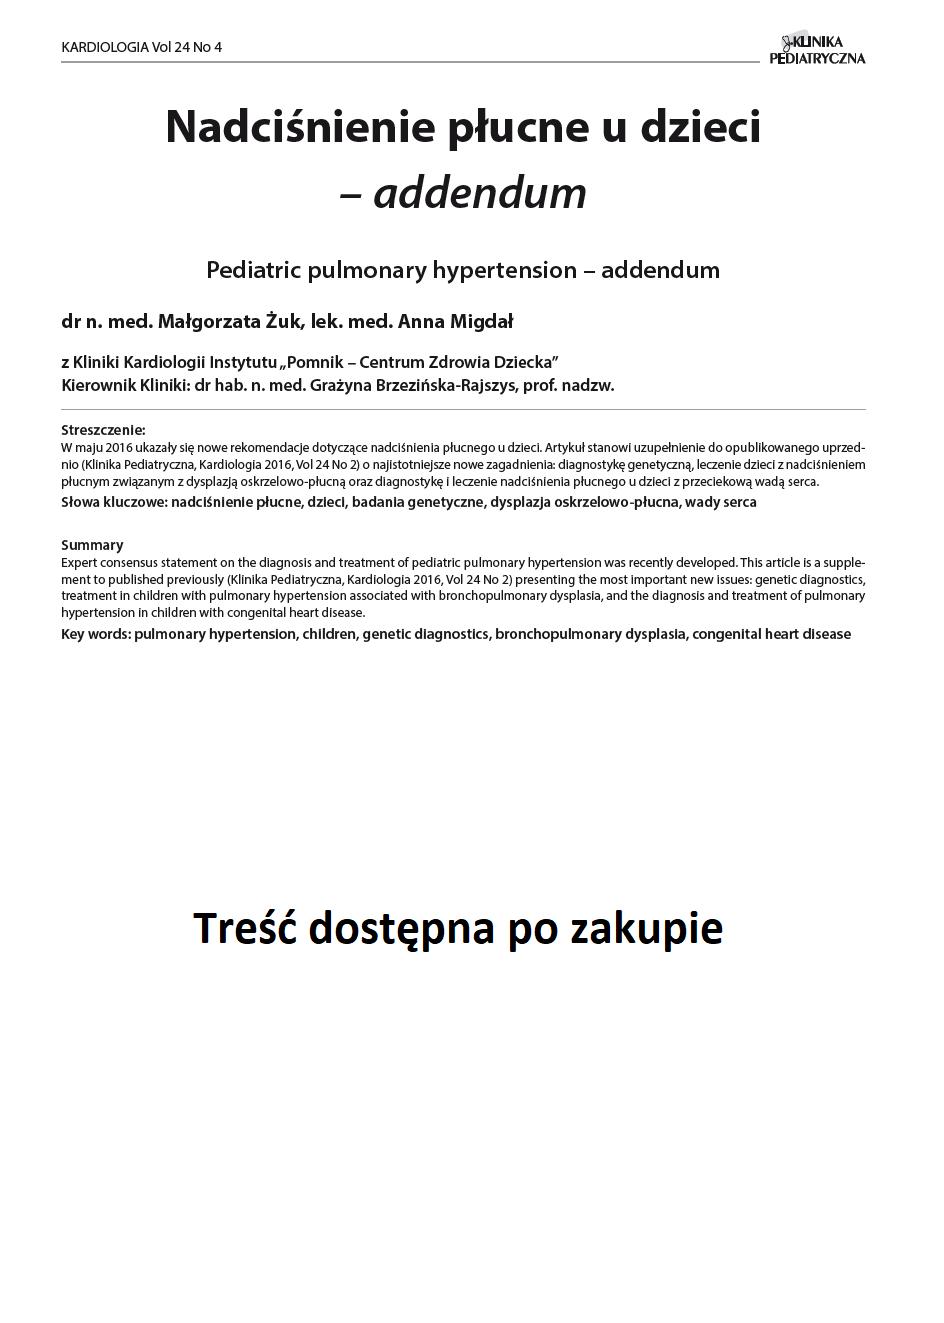 KP 4 -2016- Nadciśnienie płucne u dzieci – addendum